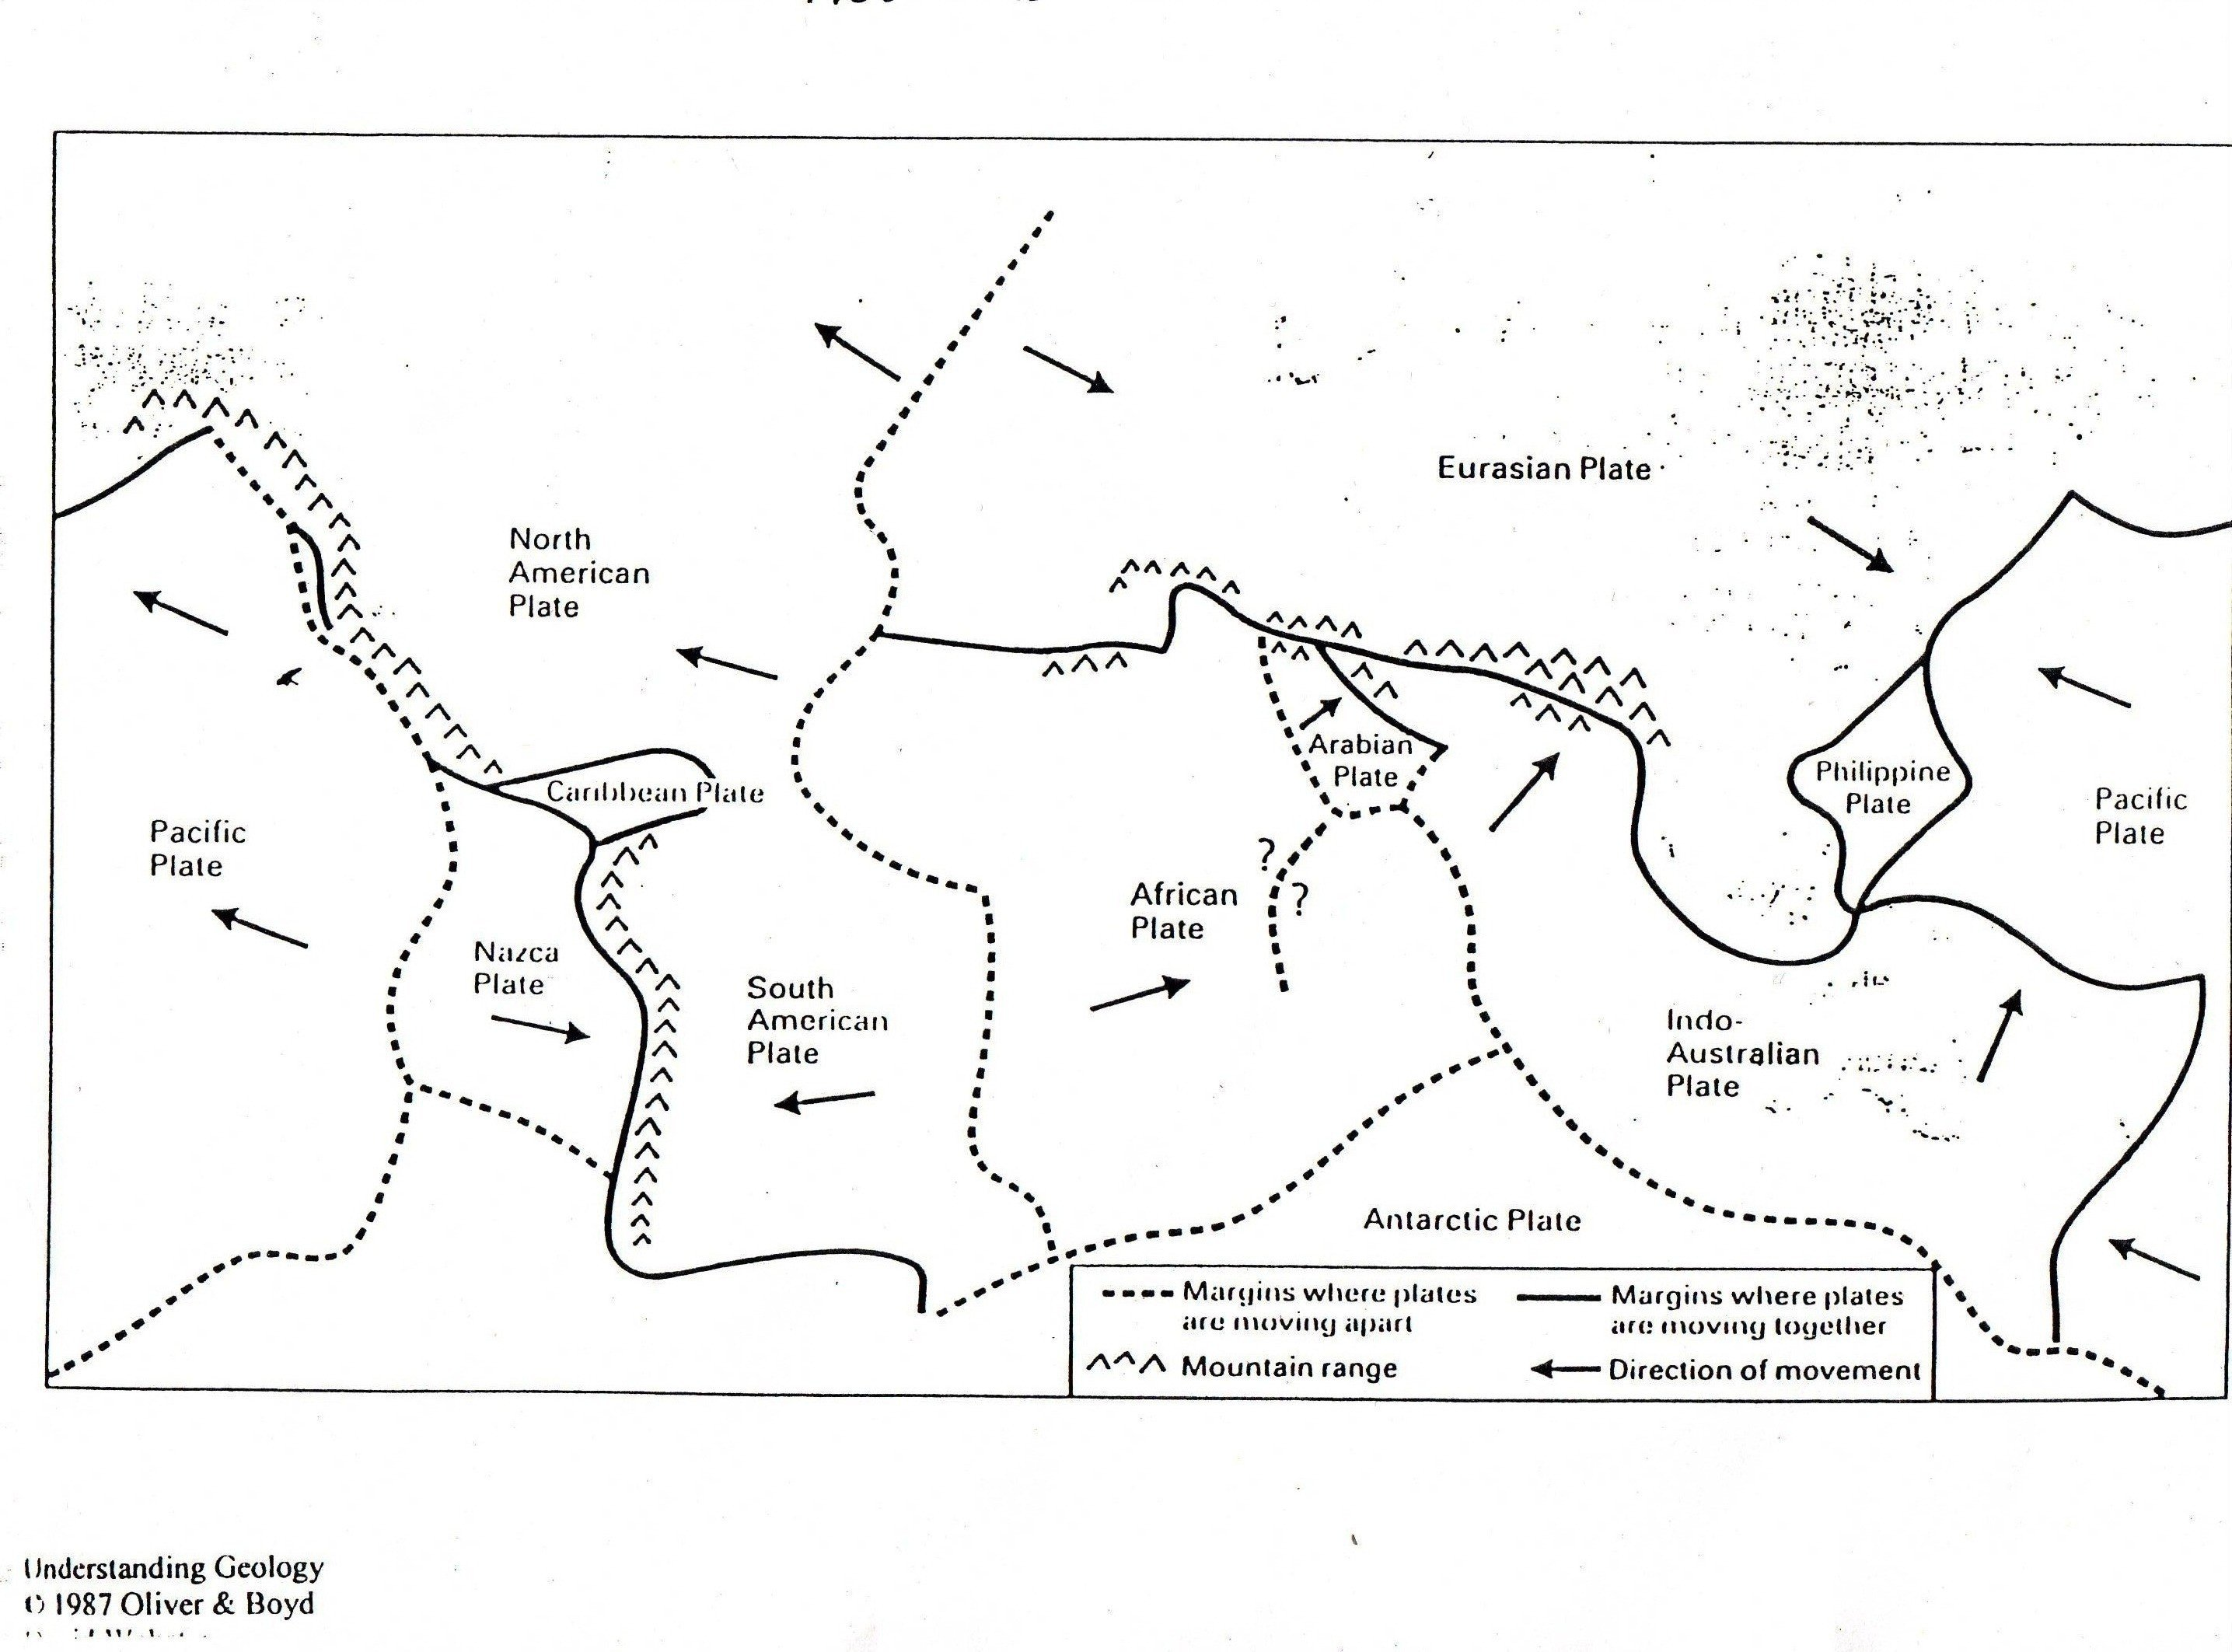 Plate Tectonic Boundaries Worksheet 843934